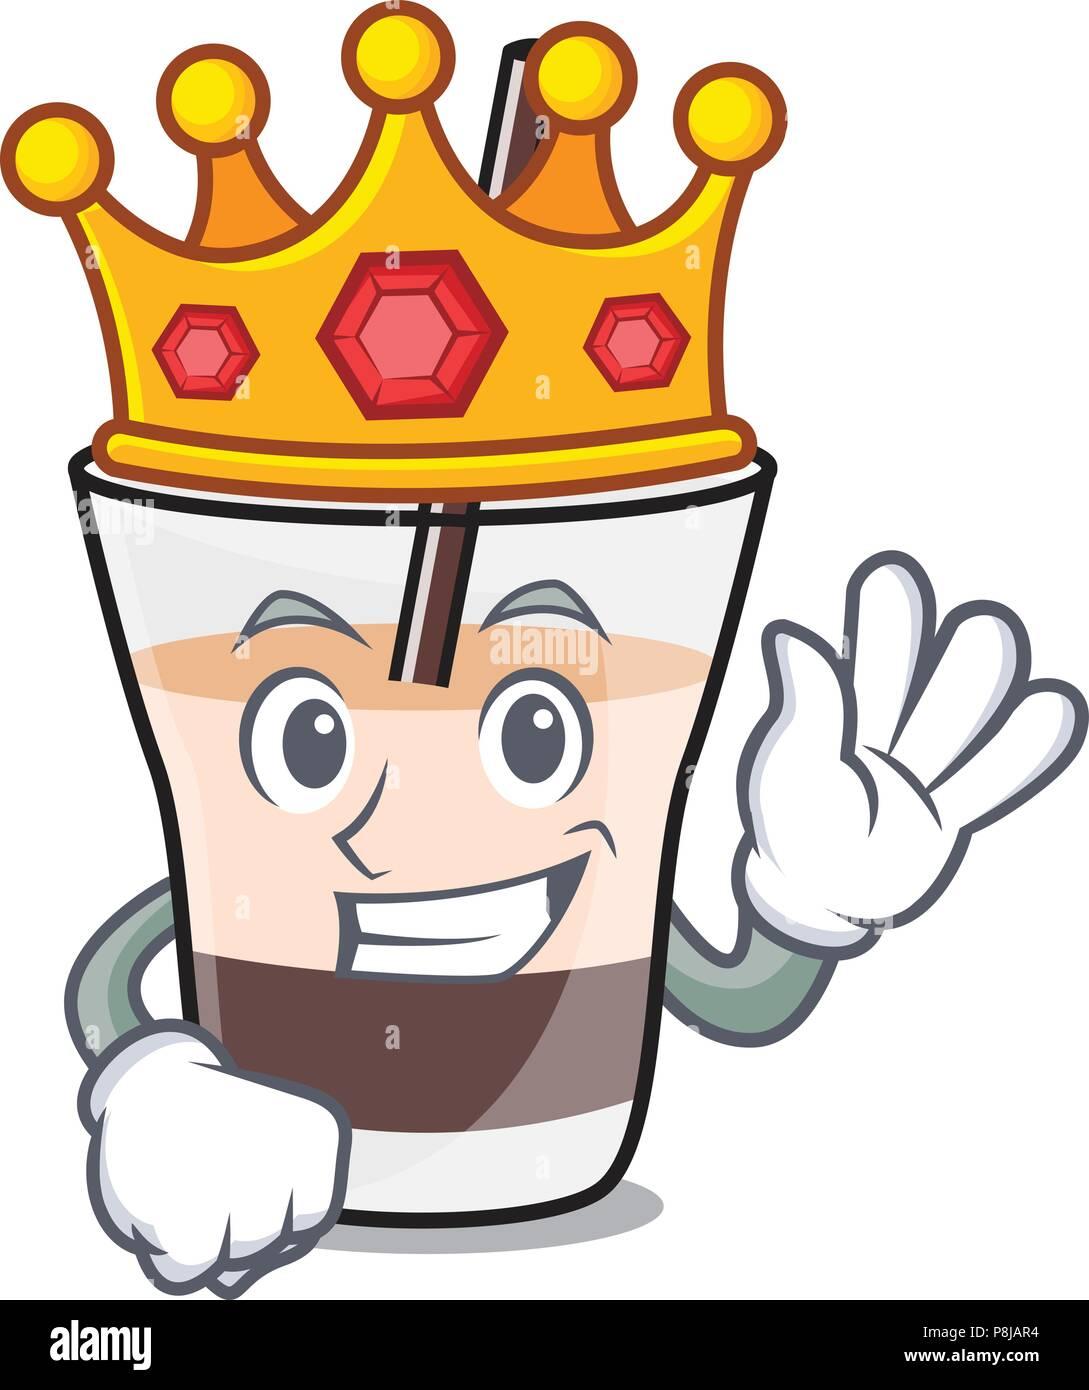 King white russian mascot cartoon - Stock Image